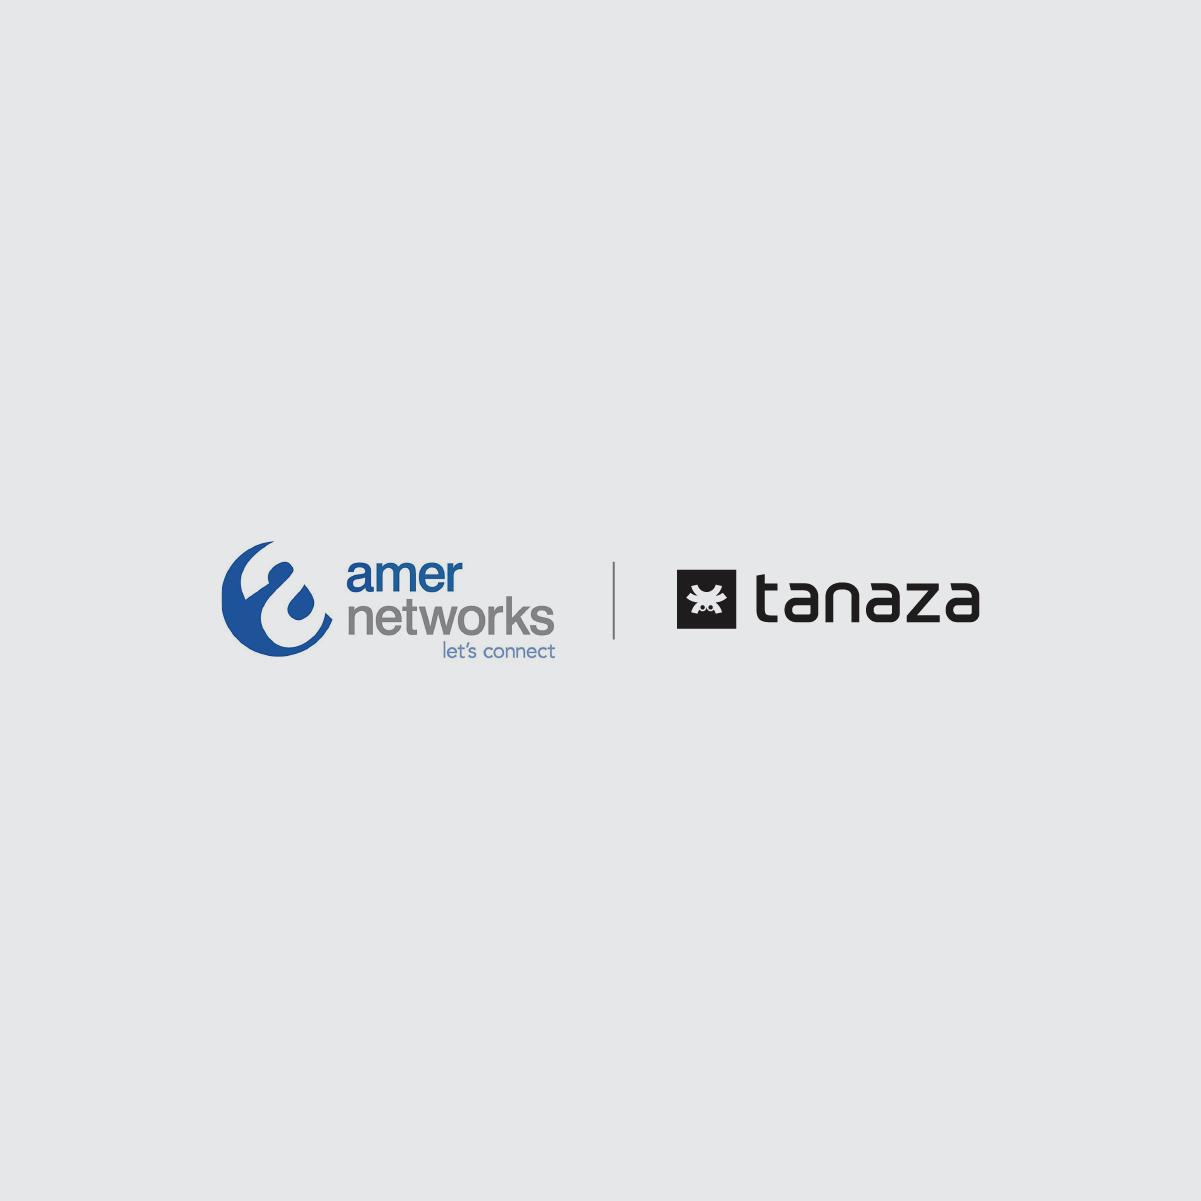 Amer Networks - Tanaza